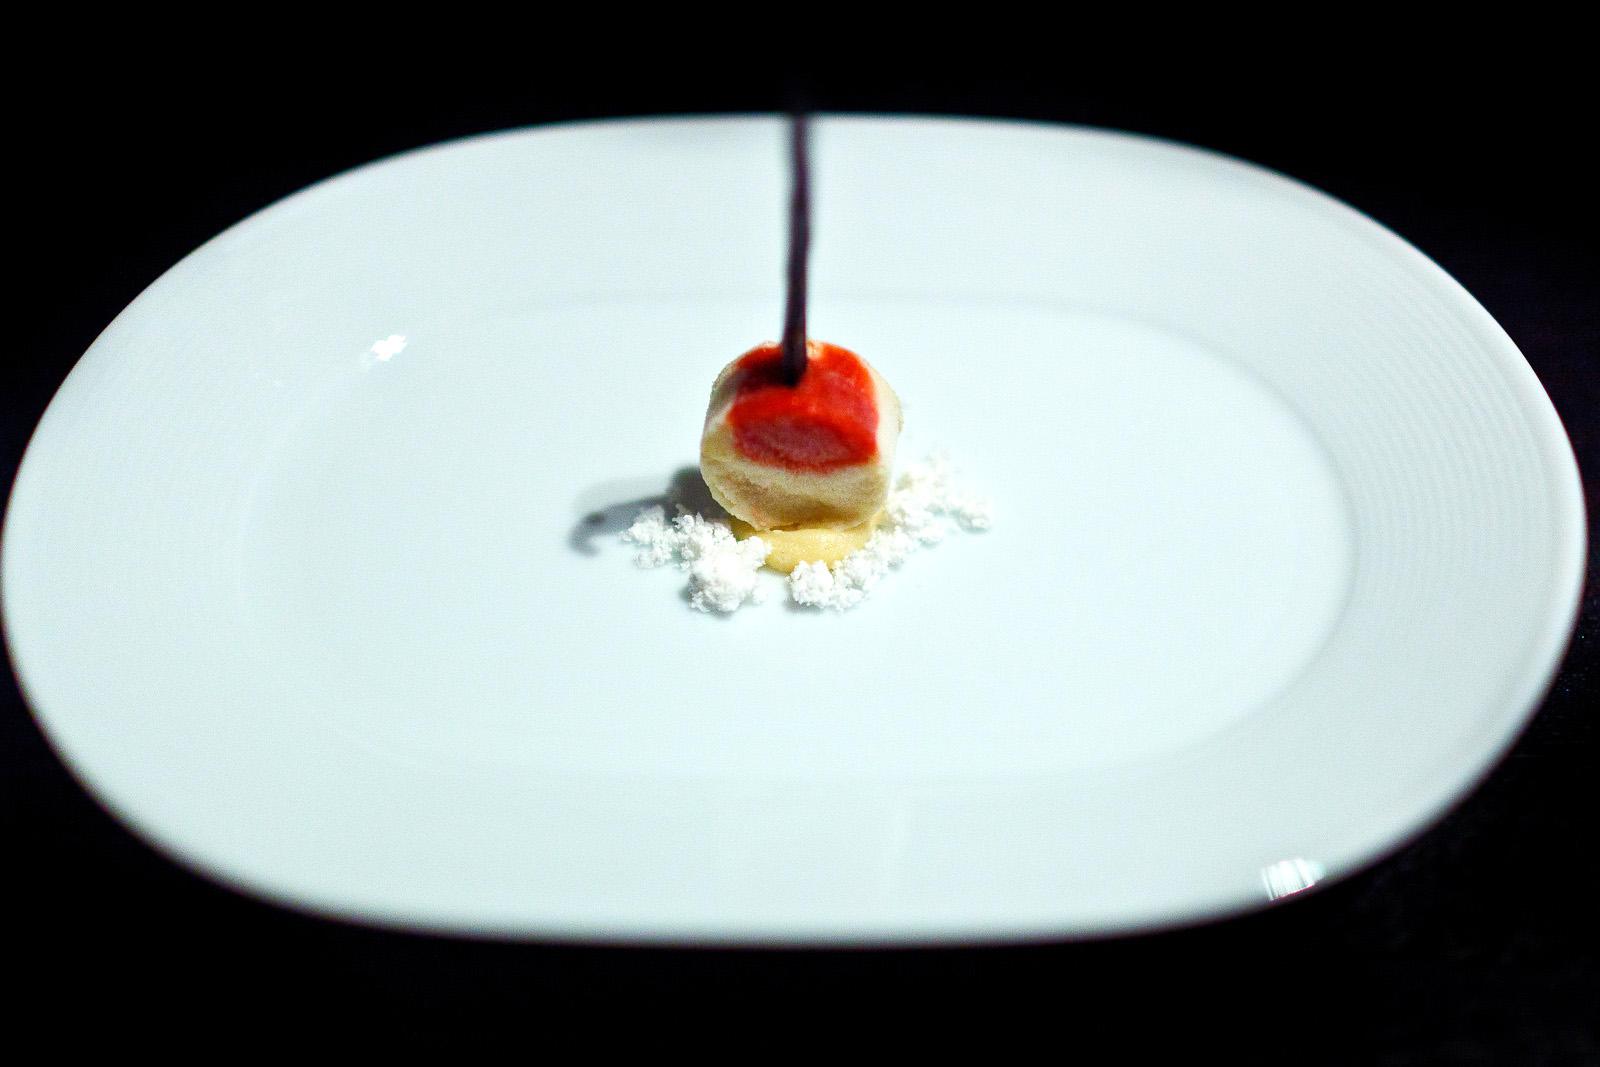 Alinea, Chicago - Pound cake, strawberry, lemon, vanilla bean